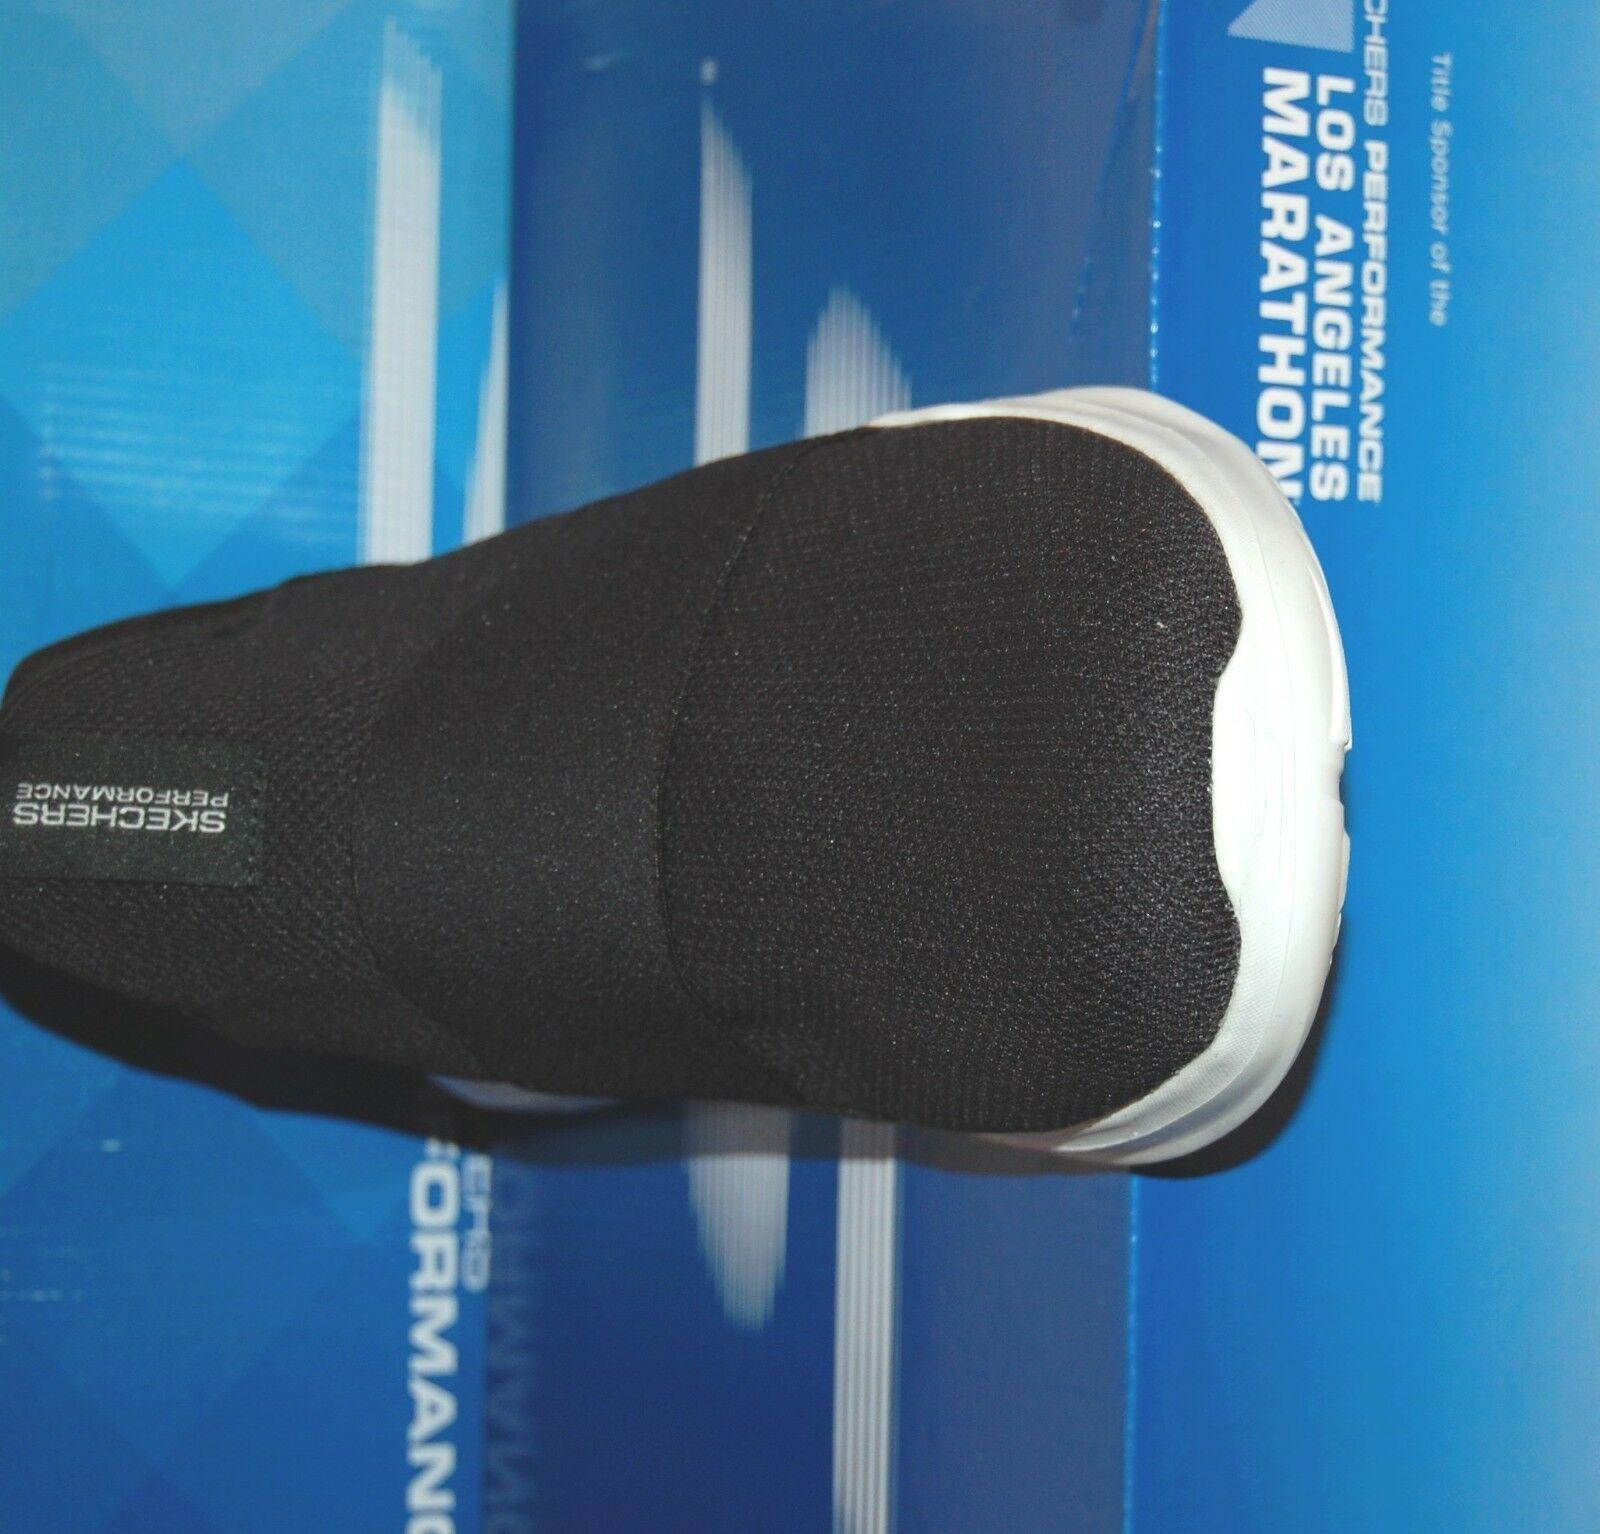 Skechers Go Run Mojo Mania Black White Men's Slip Comfort Shoes Sneakers US 12